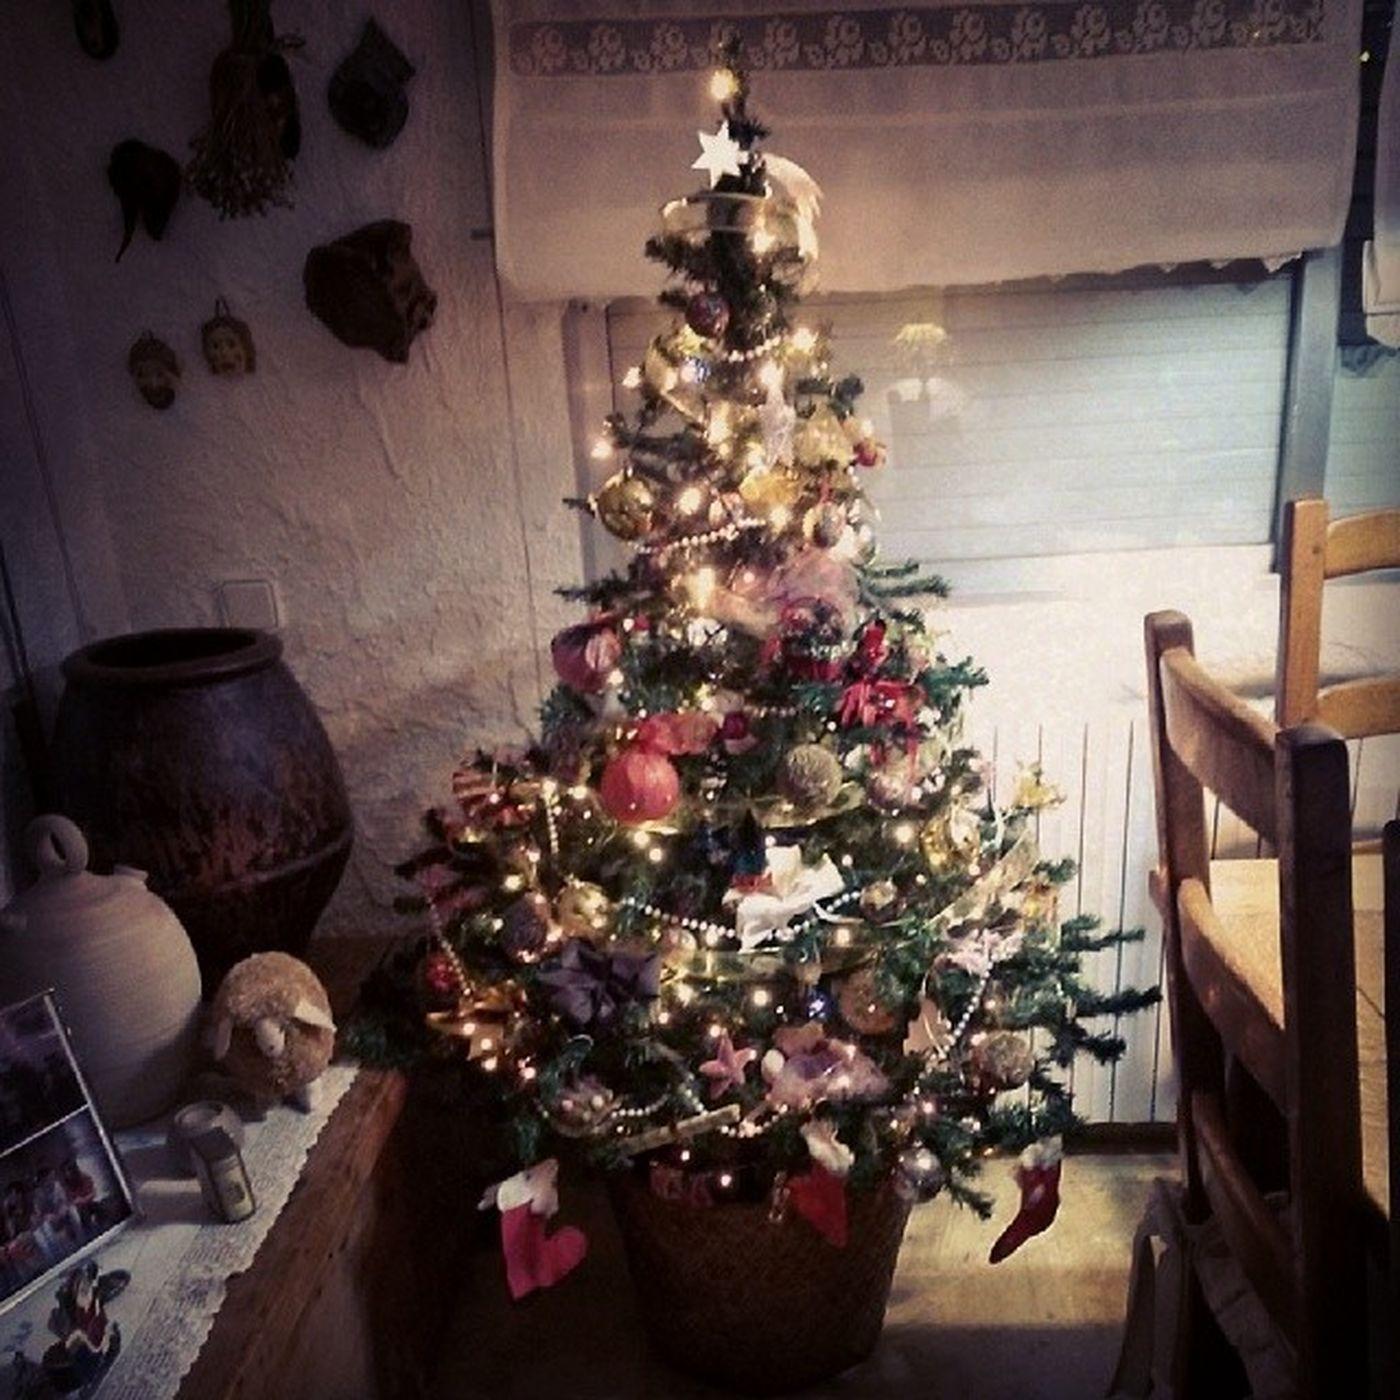 Merry Christmas! Ja esta decorat lo verd! Acasajaesnadal Espiritunavideño Lapilotafanadal